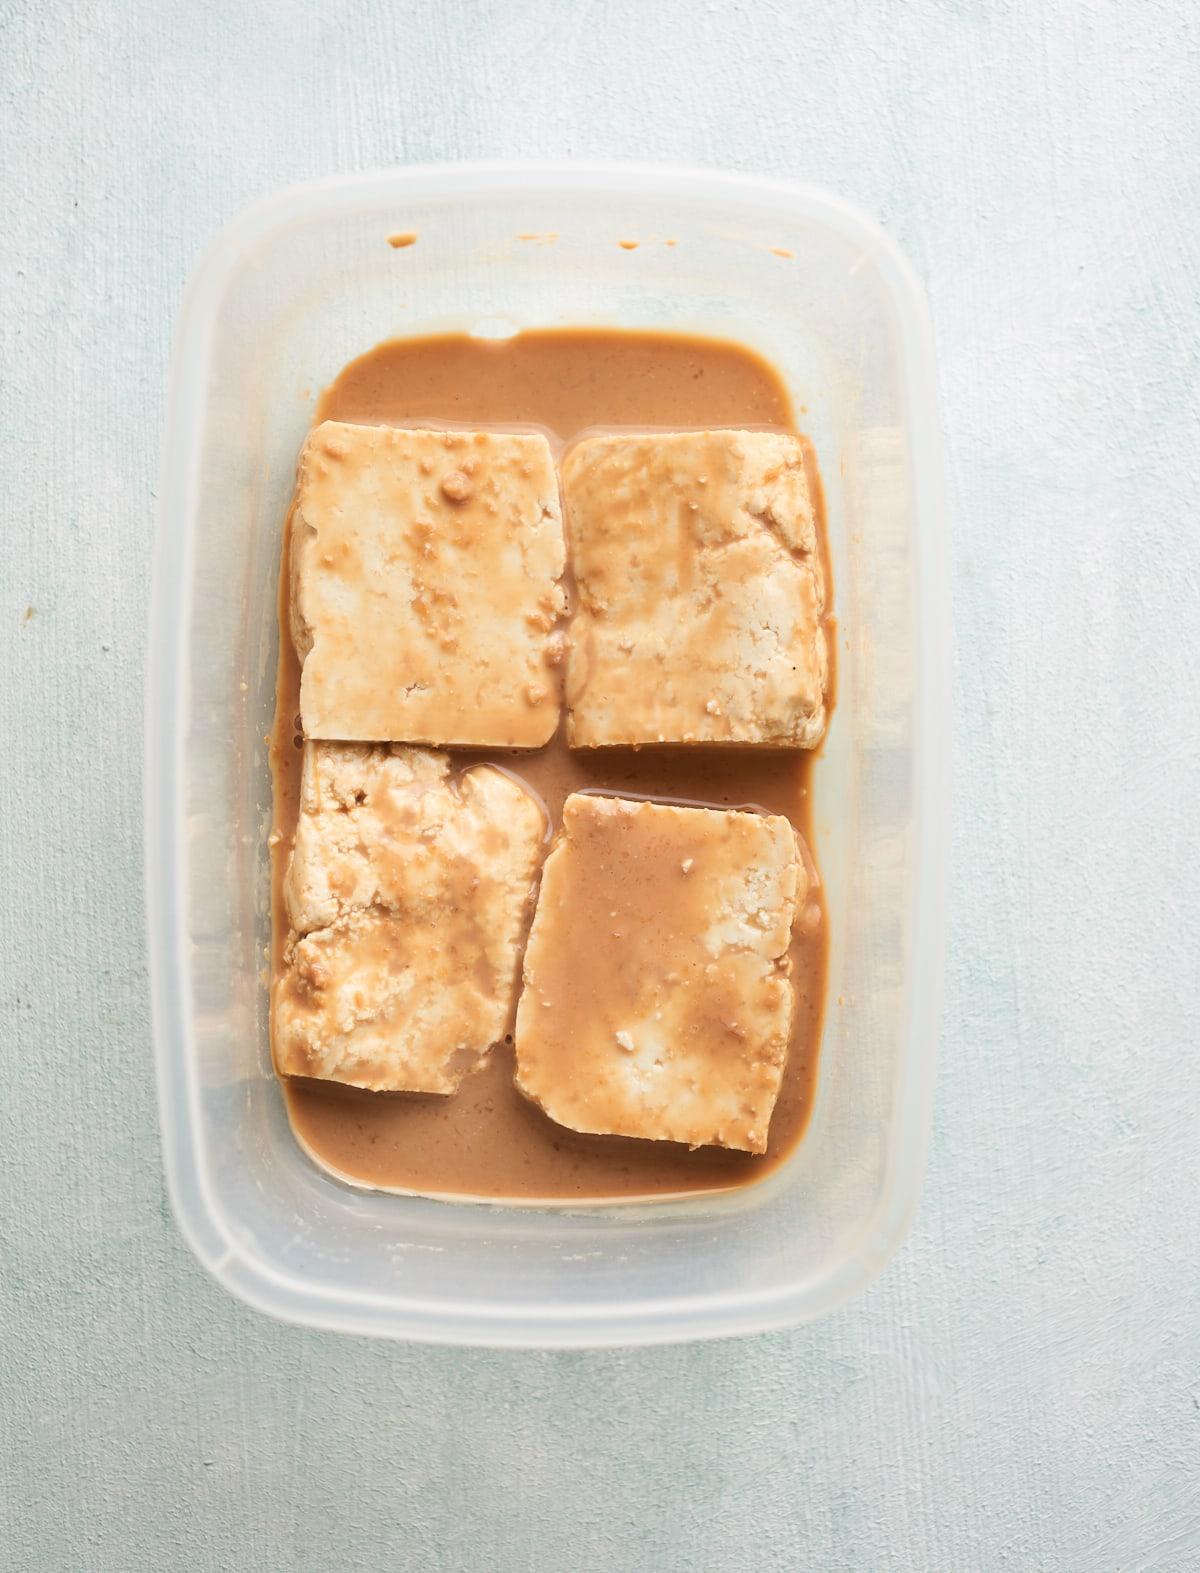 Tofu marinating in spiced coconut yoghurt